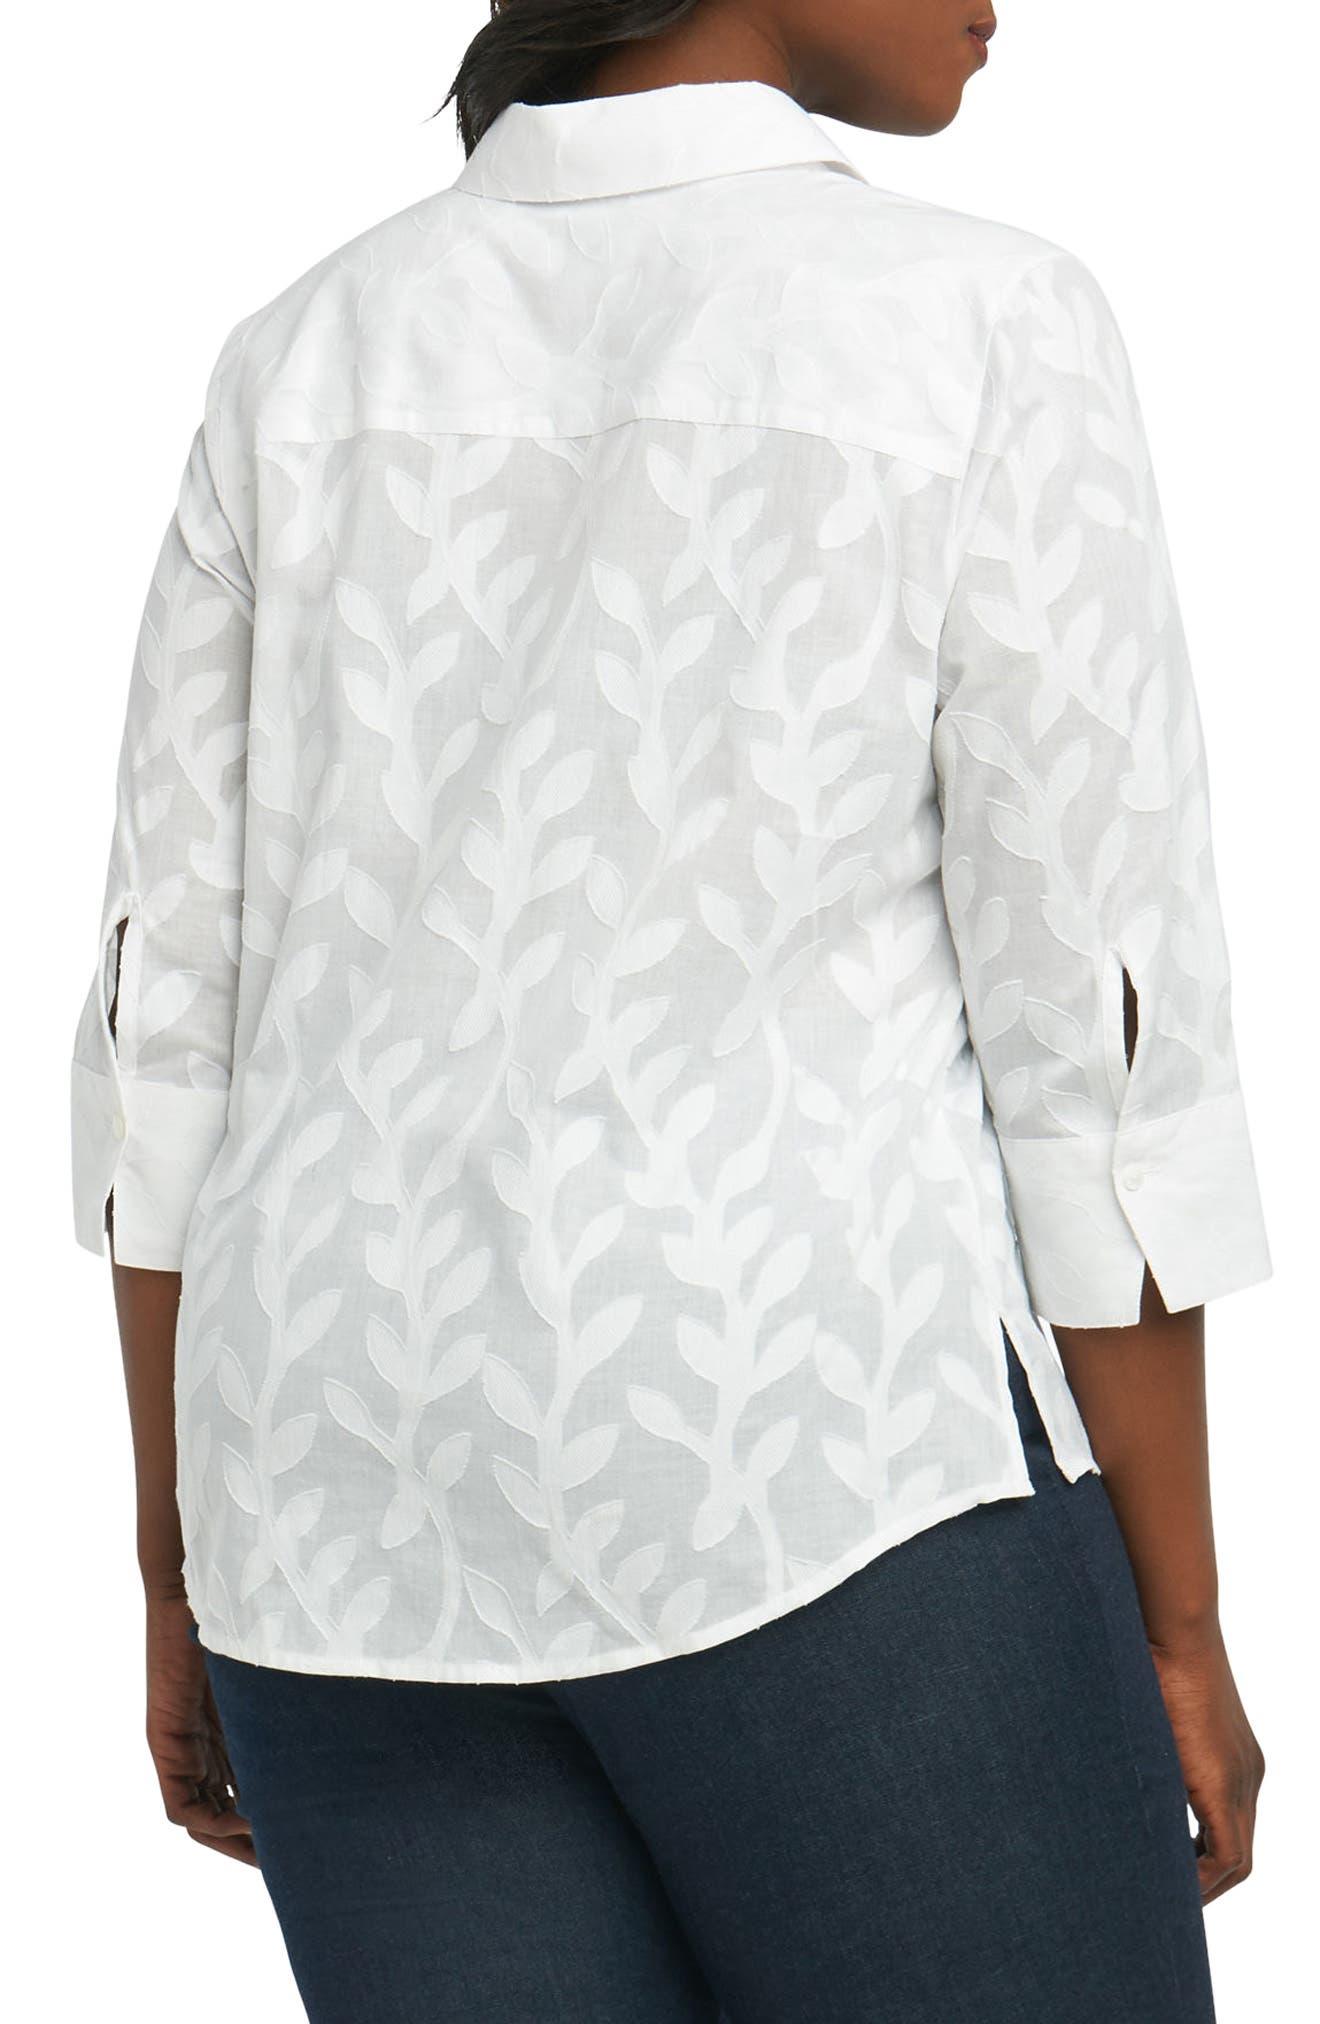 Mary Palm Jacquard Shirt,                             Alternate thumbnail 2, color,